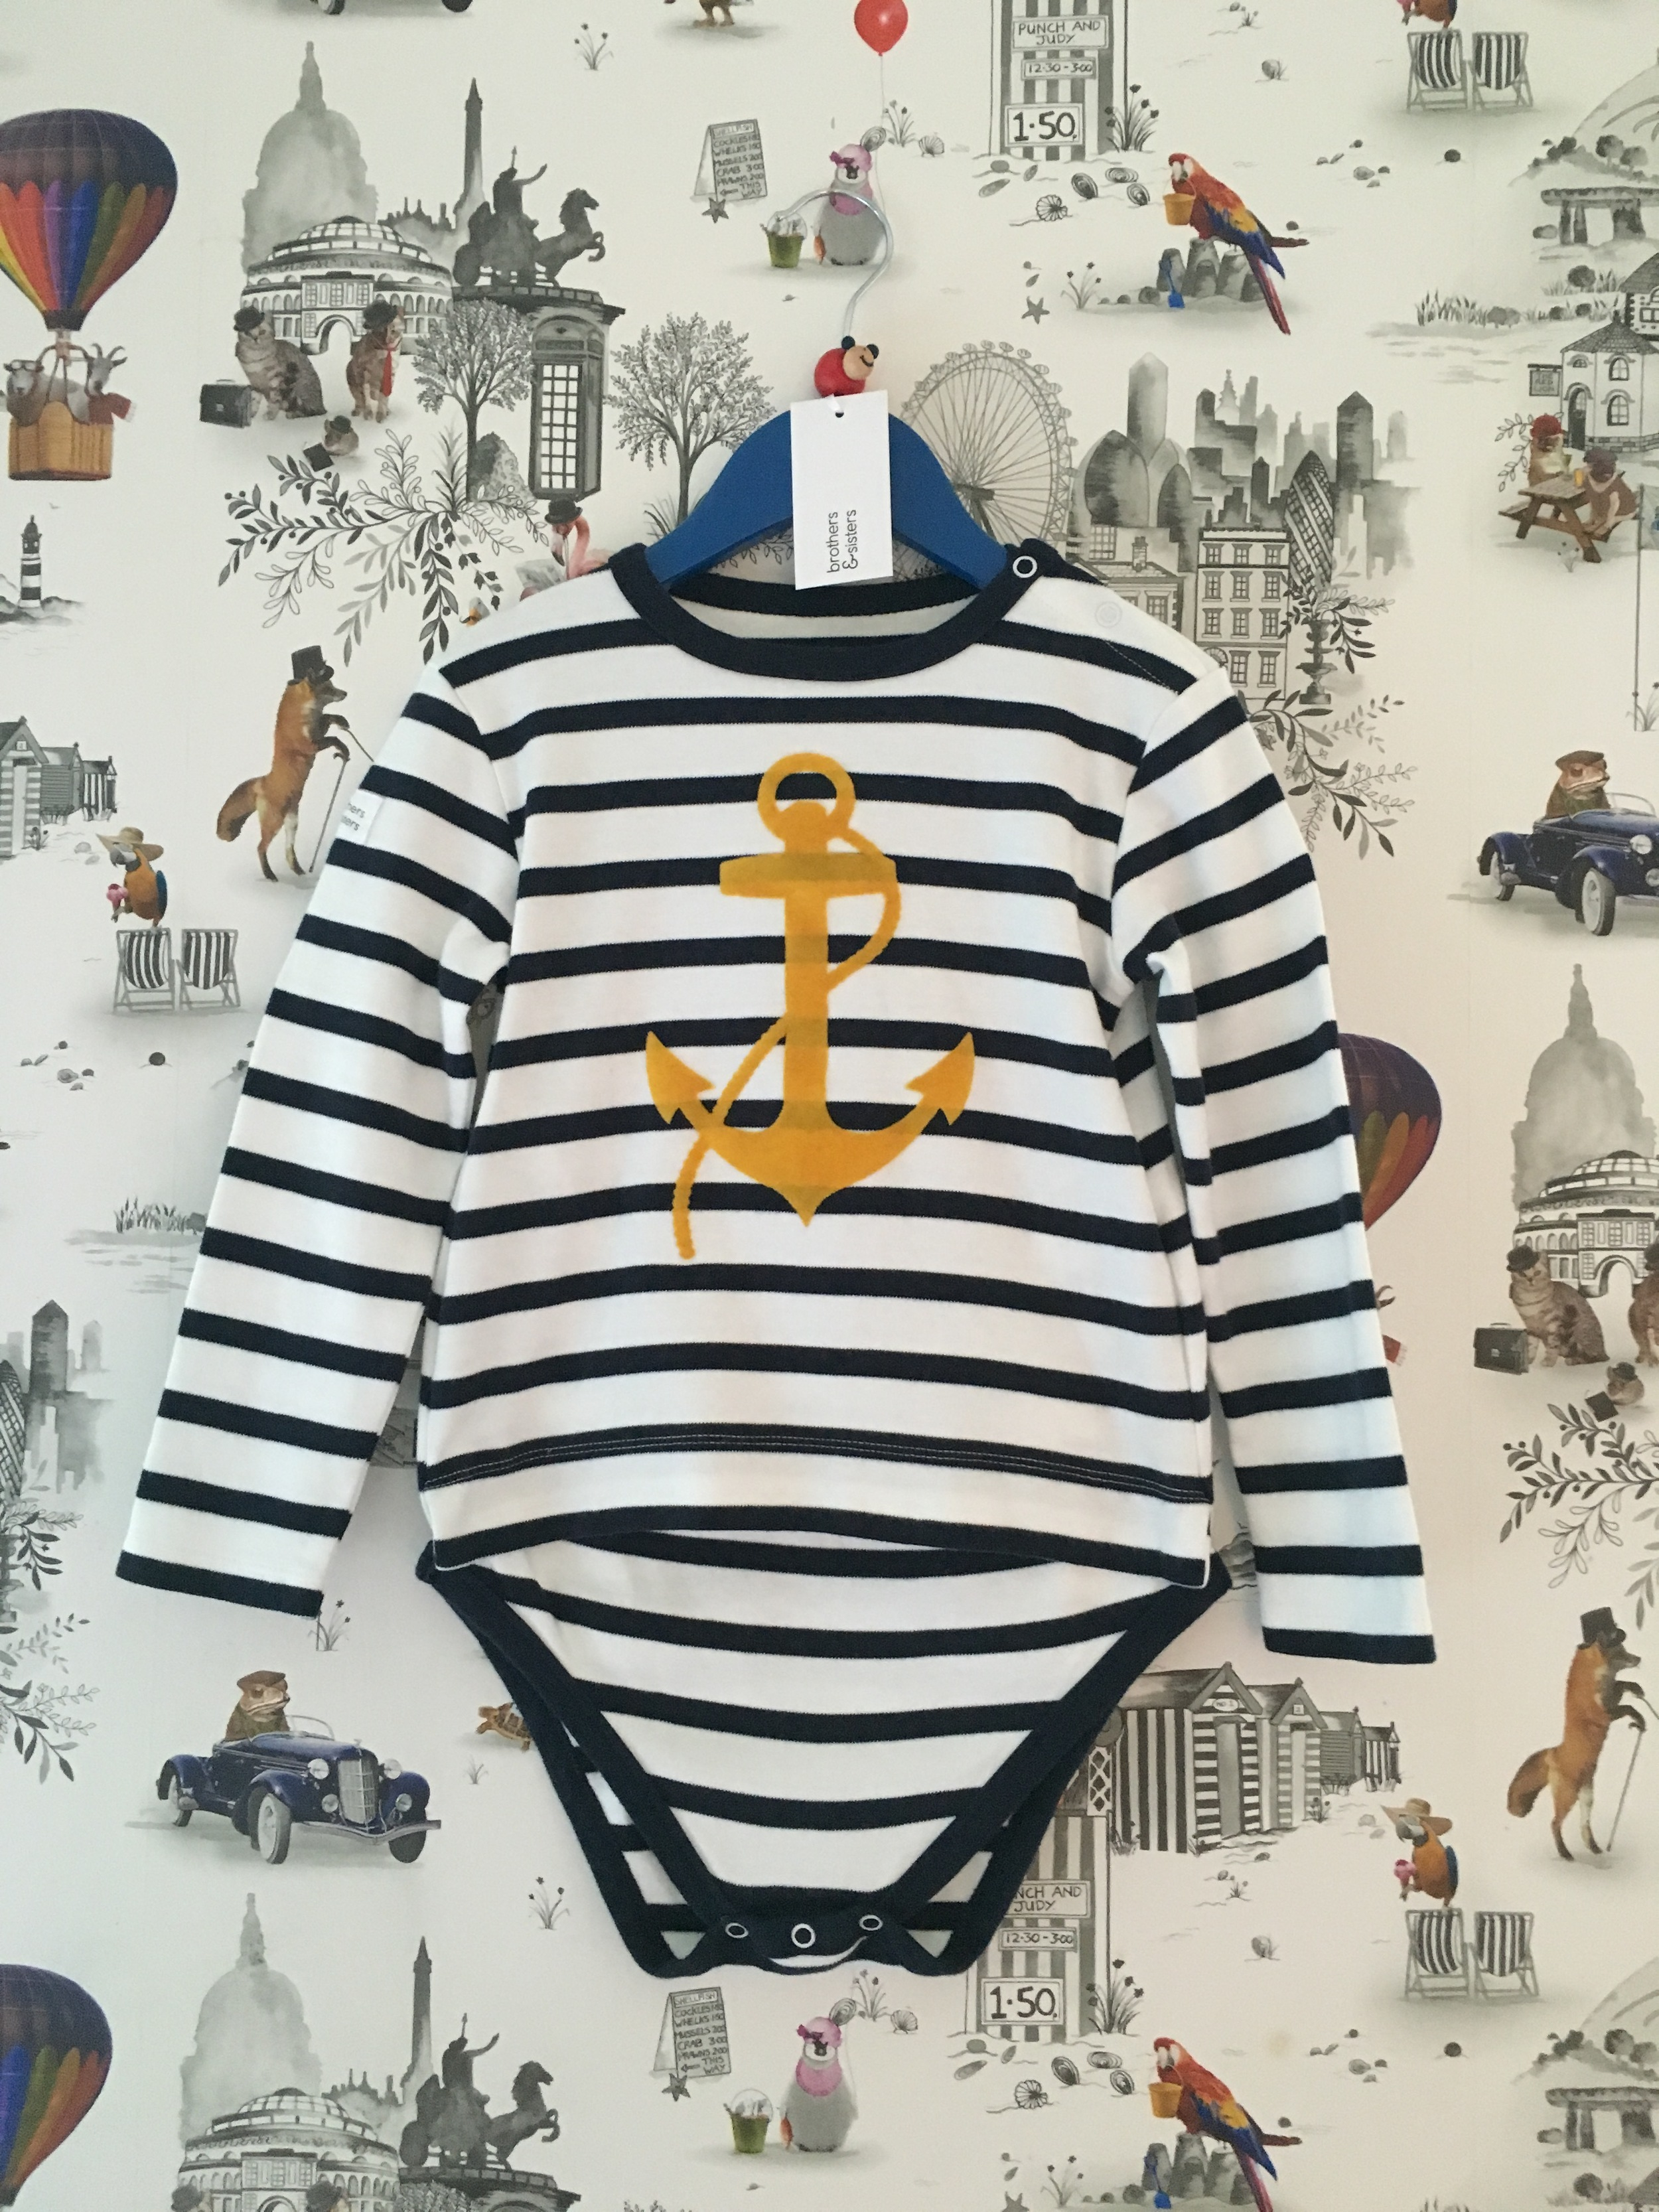 Breton Navy Stripe Anchor from  £17  sizes 3-4yrs/5-6yrs/7-8yrs/9-10yrs